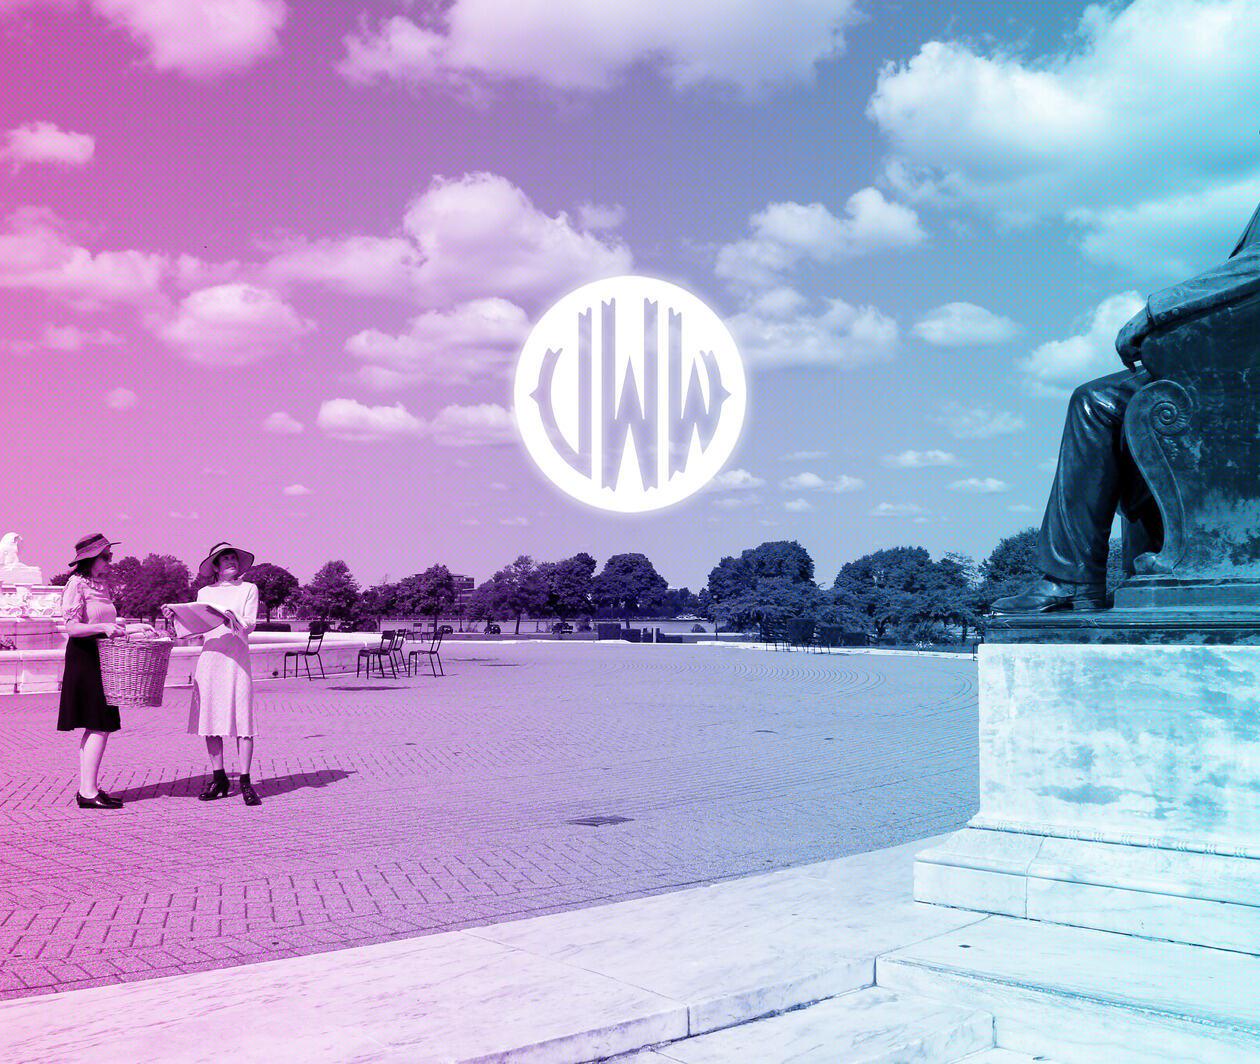 Visualizing Women's Work: Using Art Media for Social Justice